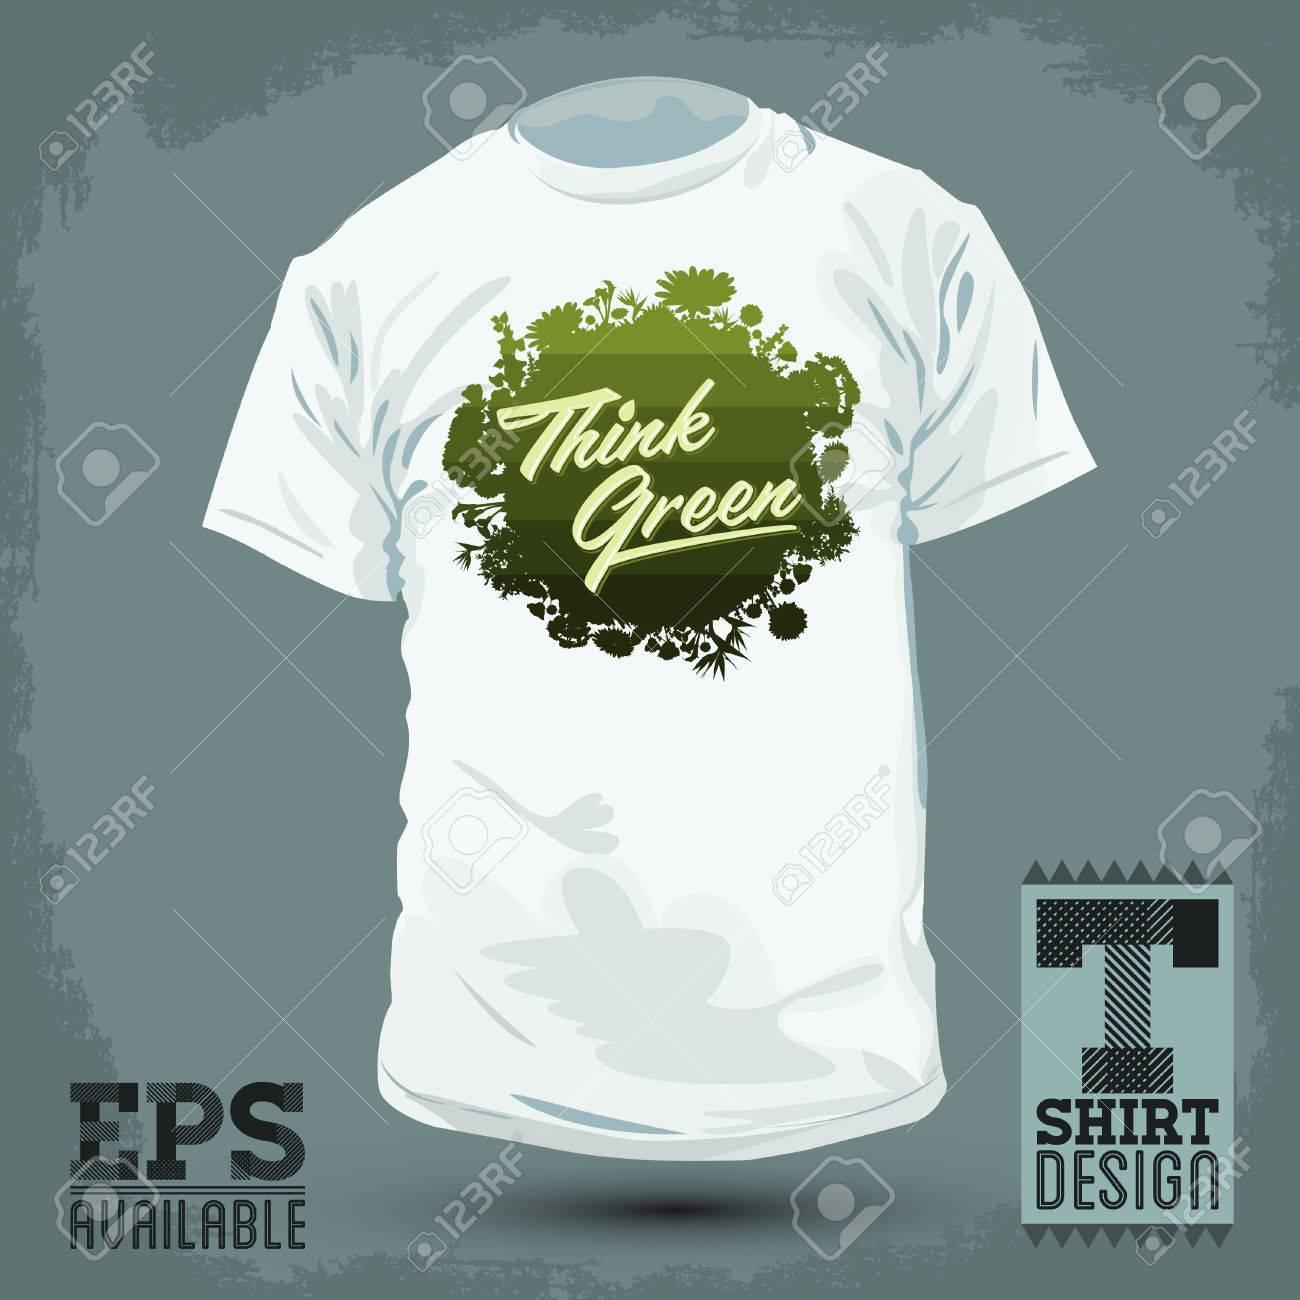 Graphic T Shirt Design Think Green Shirt Print Creative